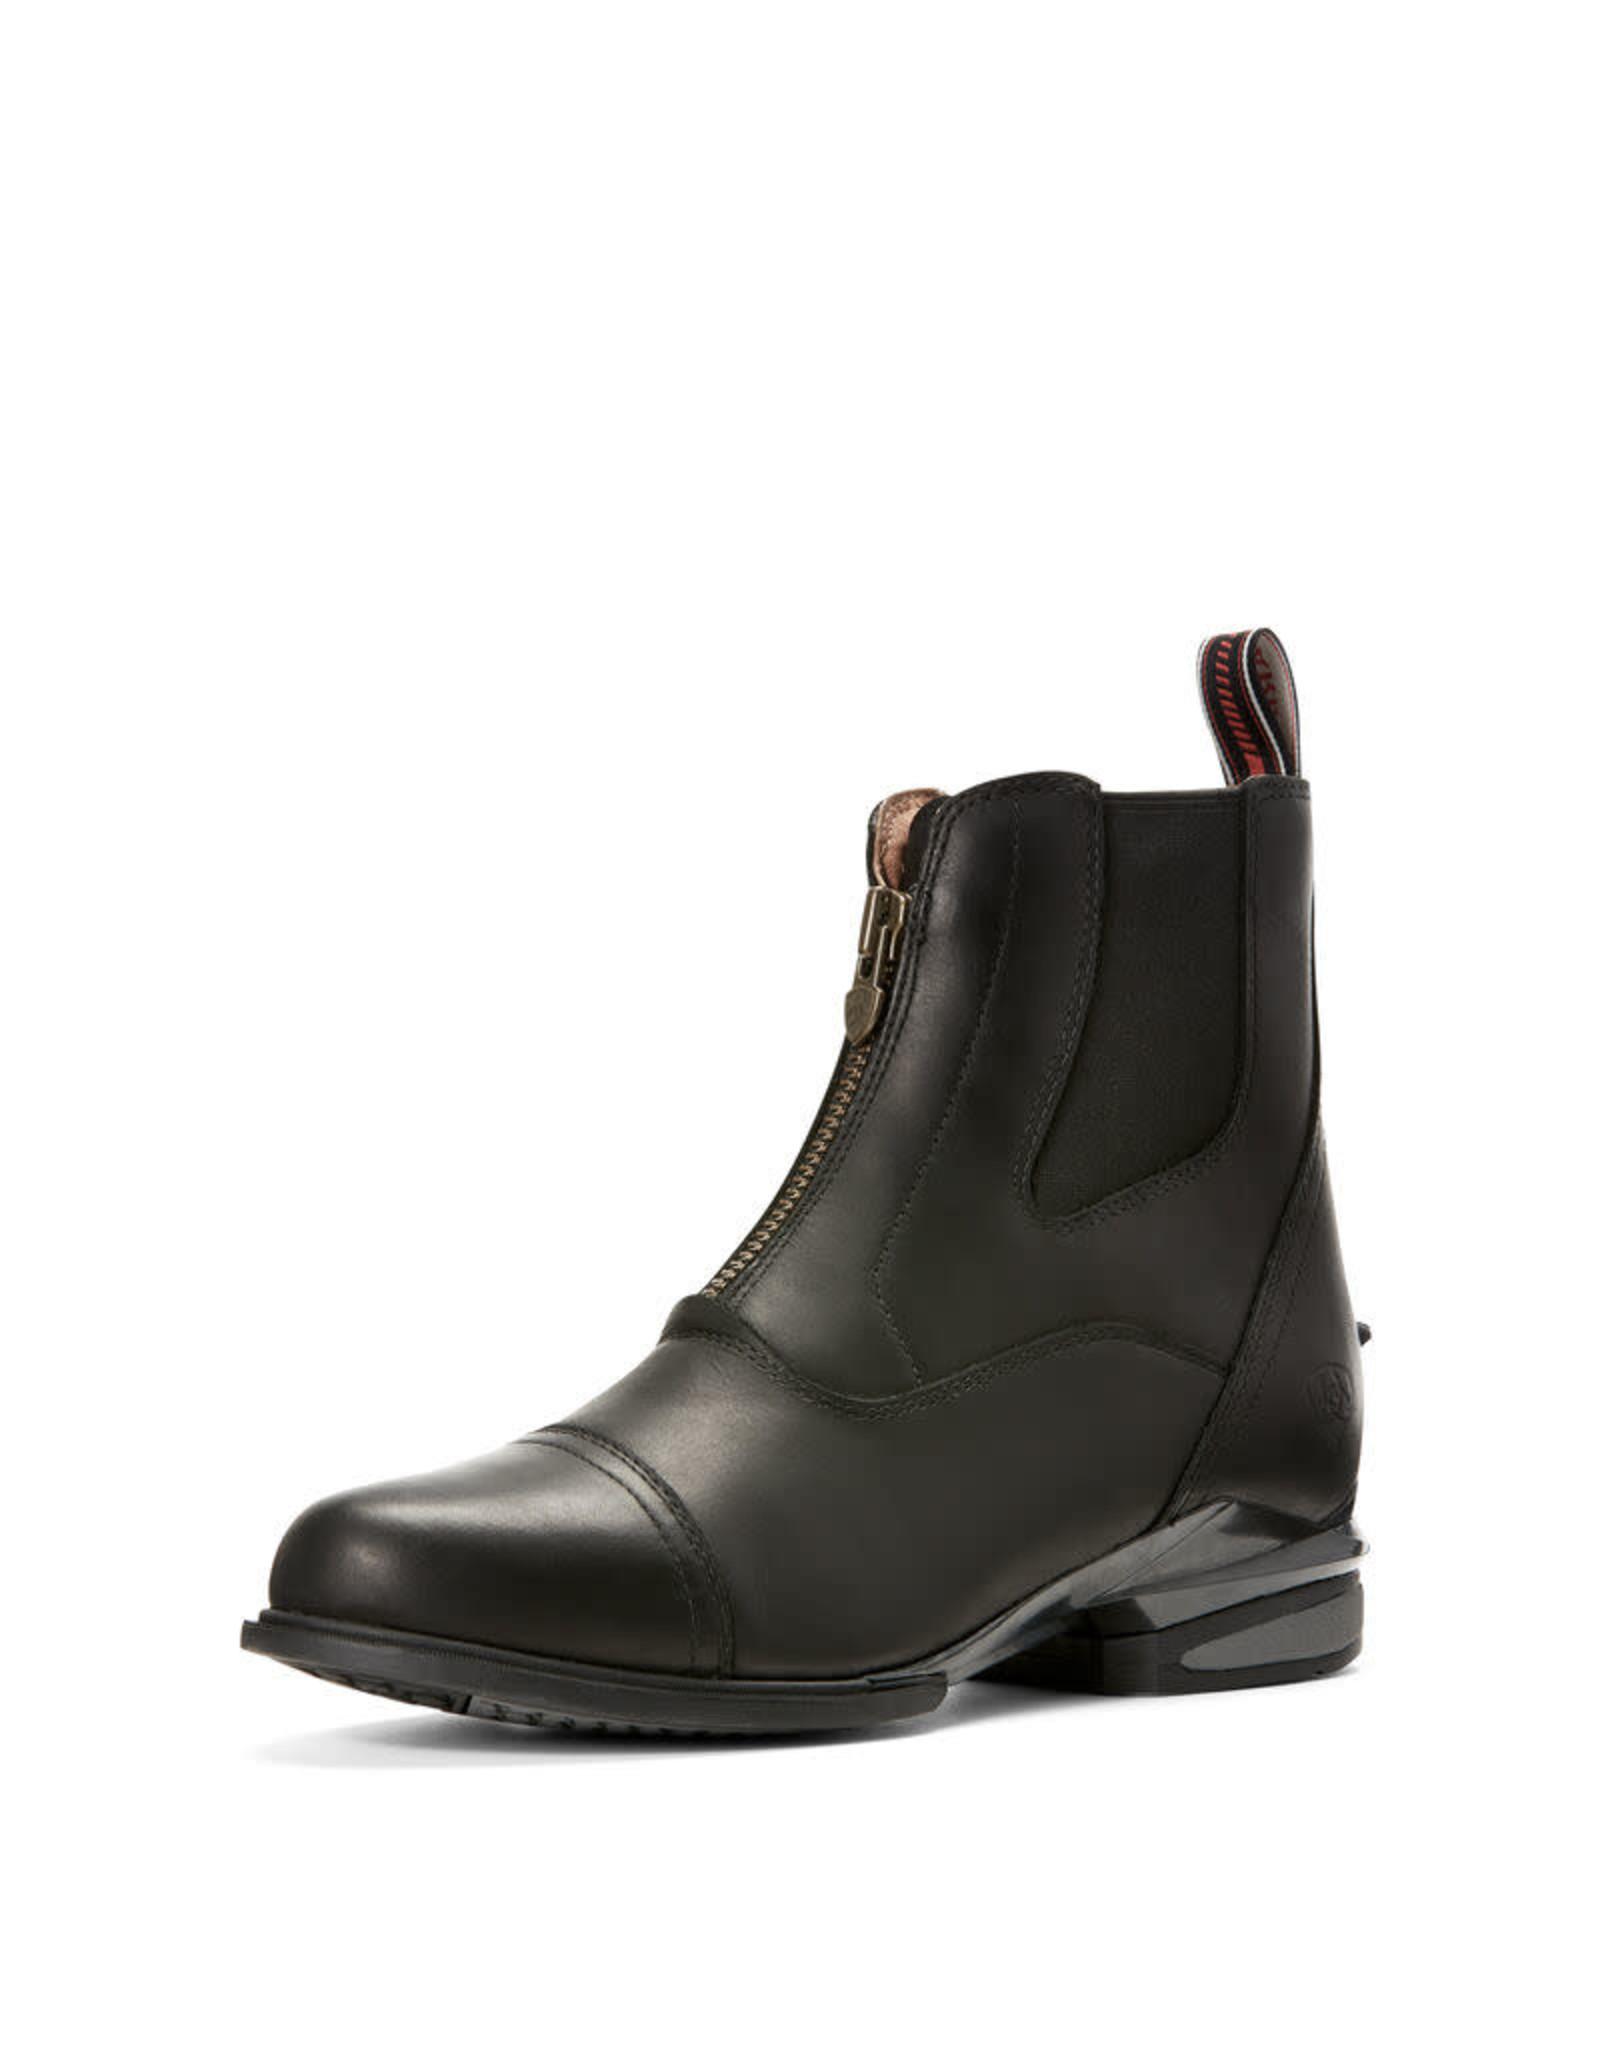 Ariat Paddock Boot Devon Nitro